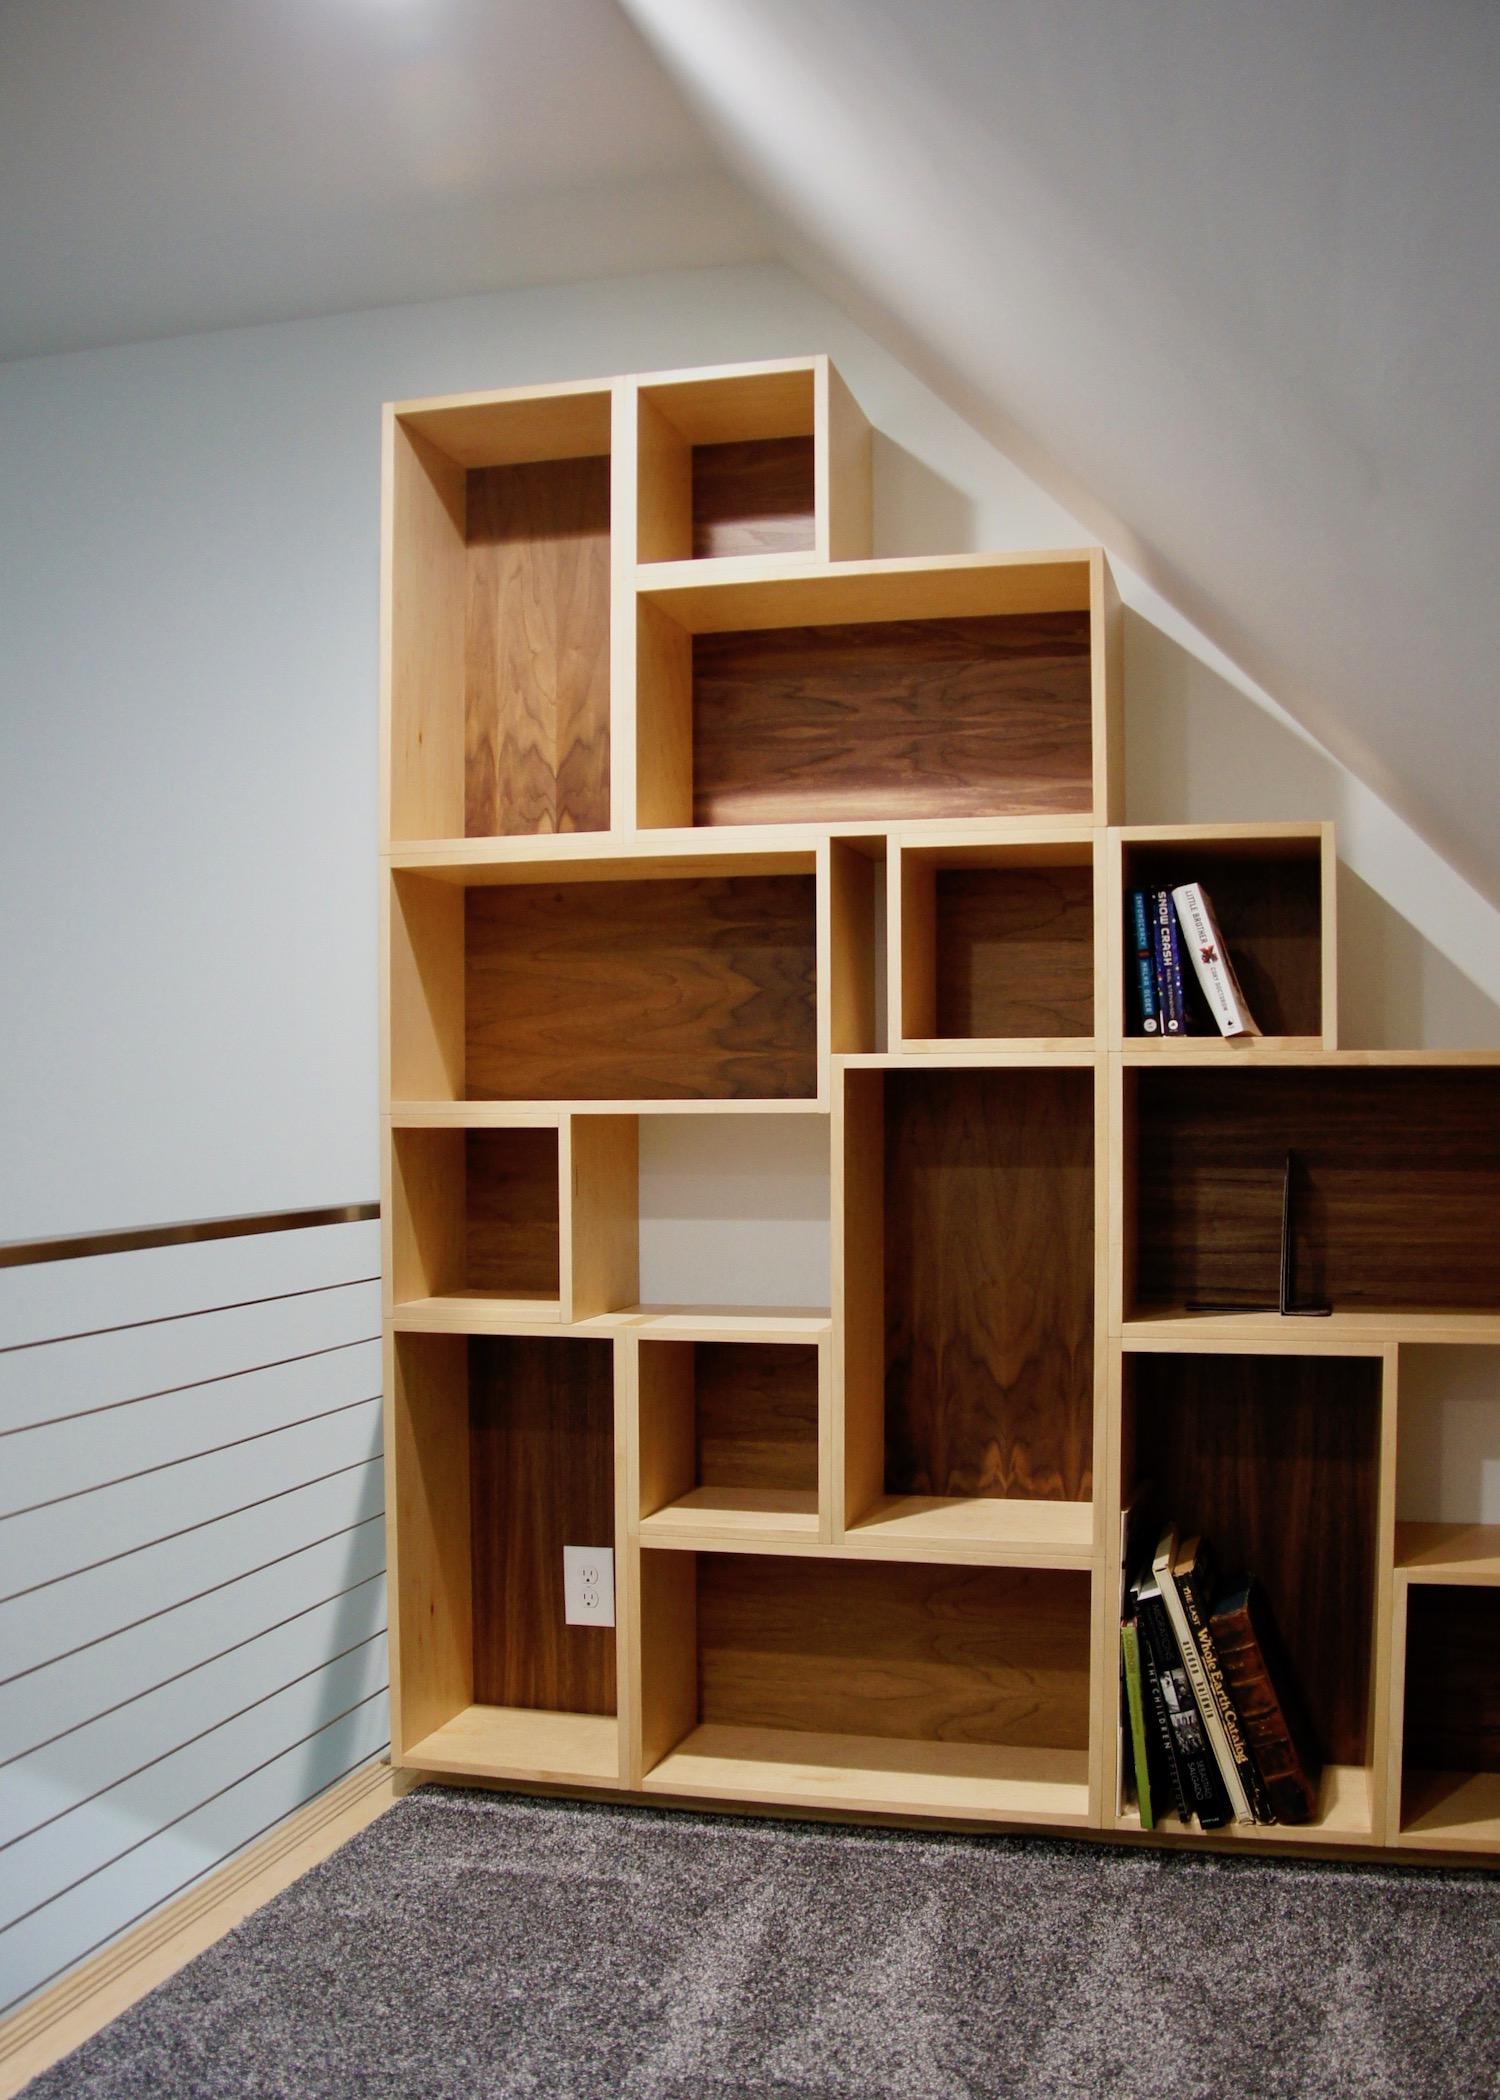 Loft bookcase 01.jpeg